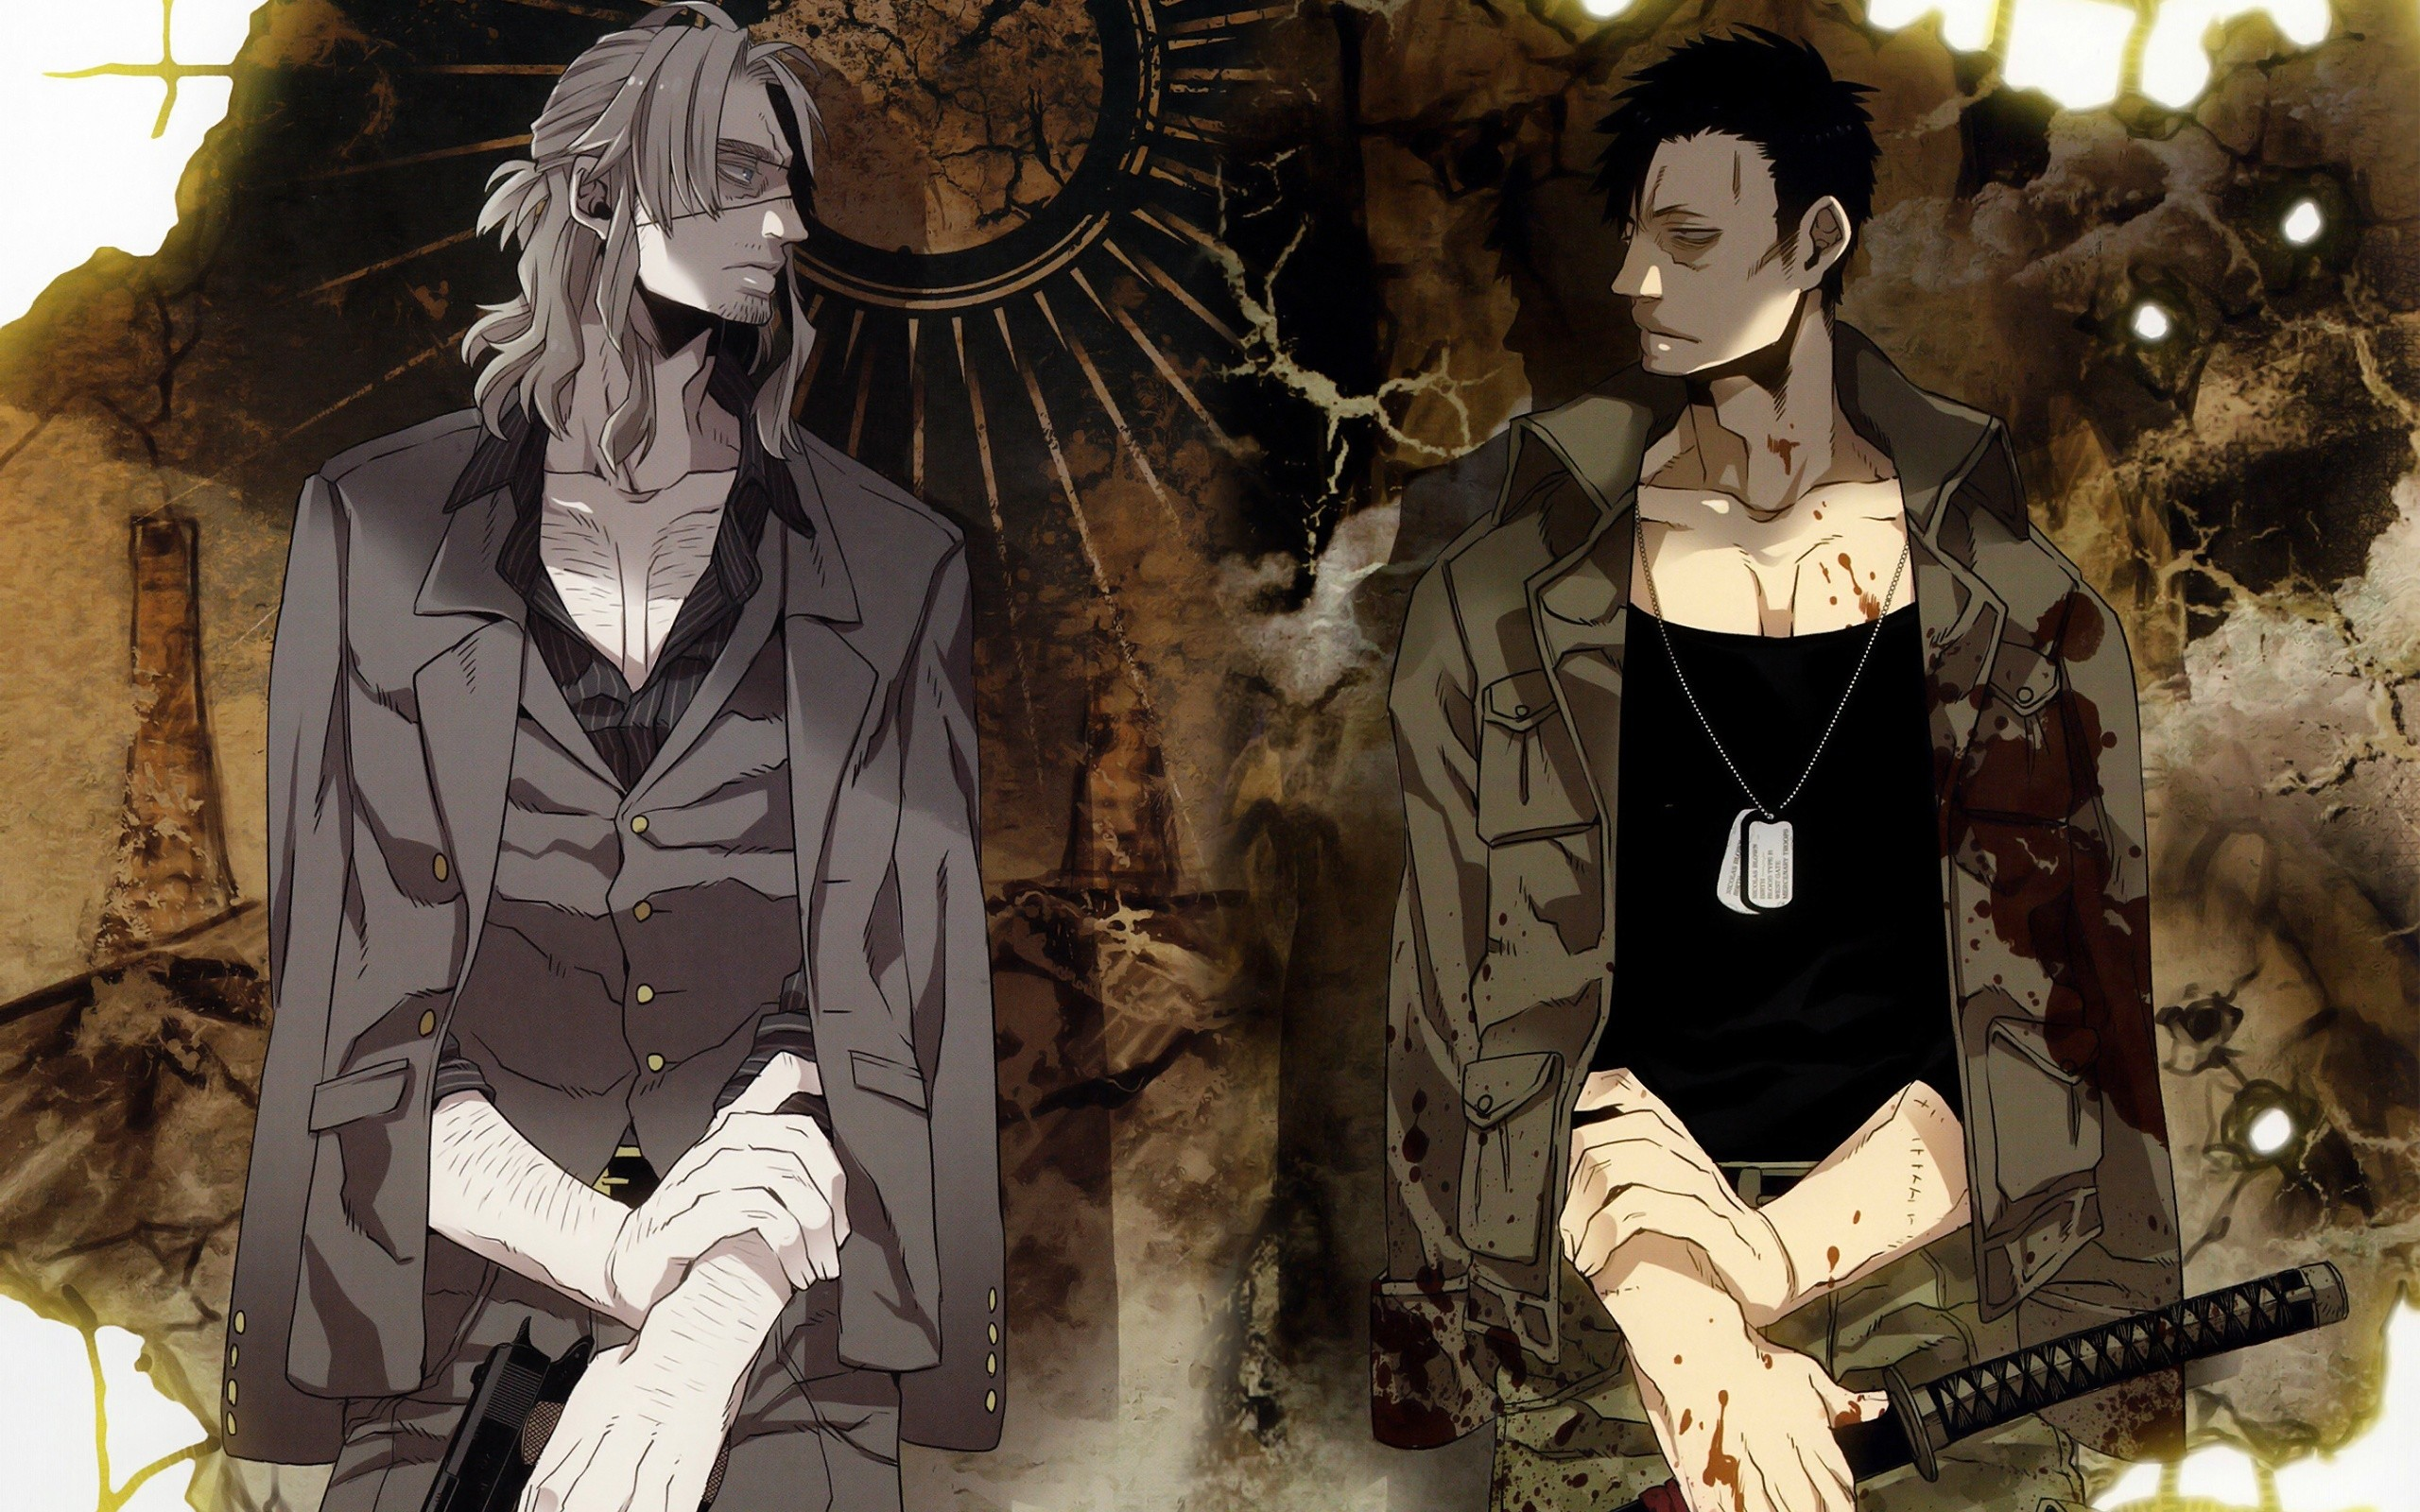 Res: 2560x1600, GANGSTA. Wallpapers de Anime - Parte 6. Charlotte